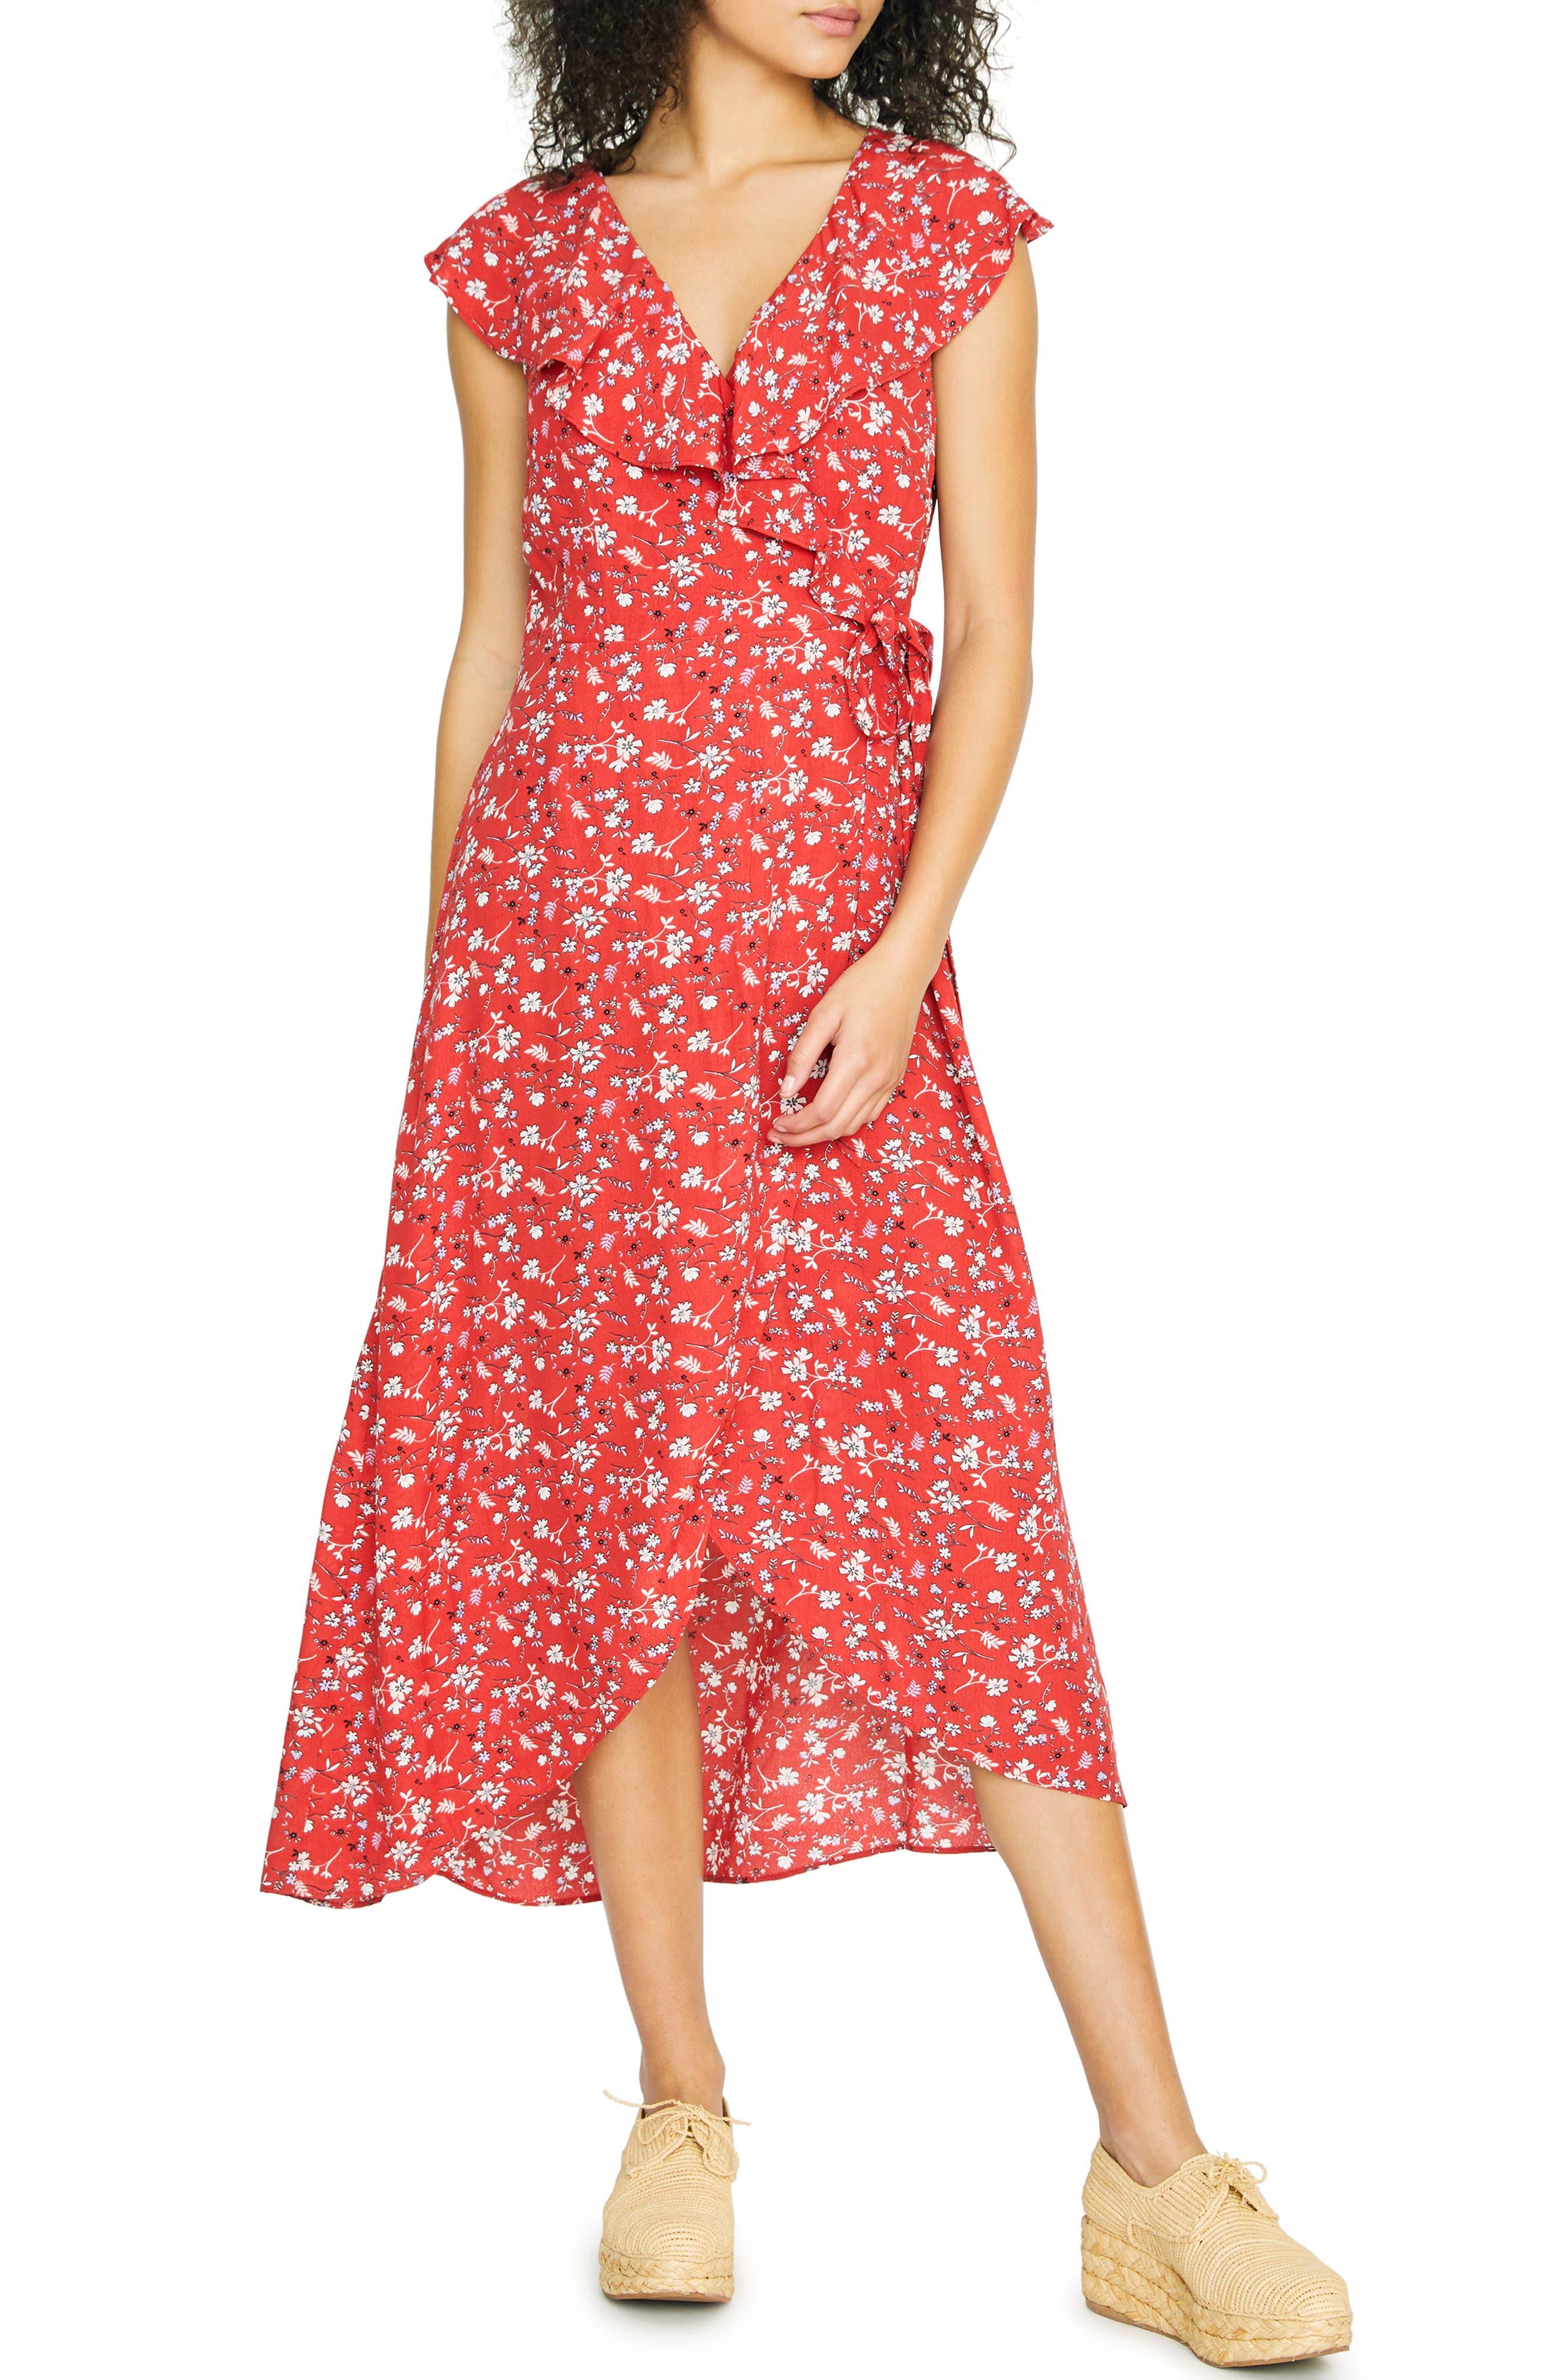 SANCTUARY Jolynn Faux Wrap Midi Dress, Main, color, SIMPLY RED